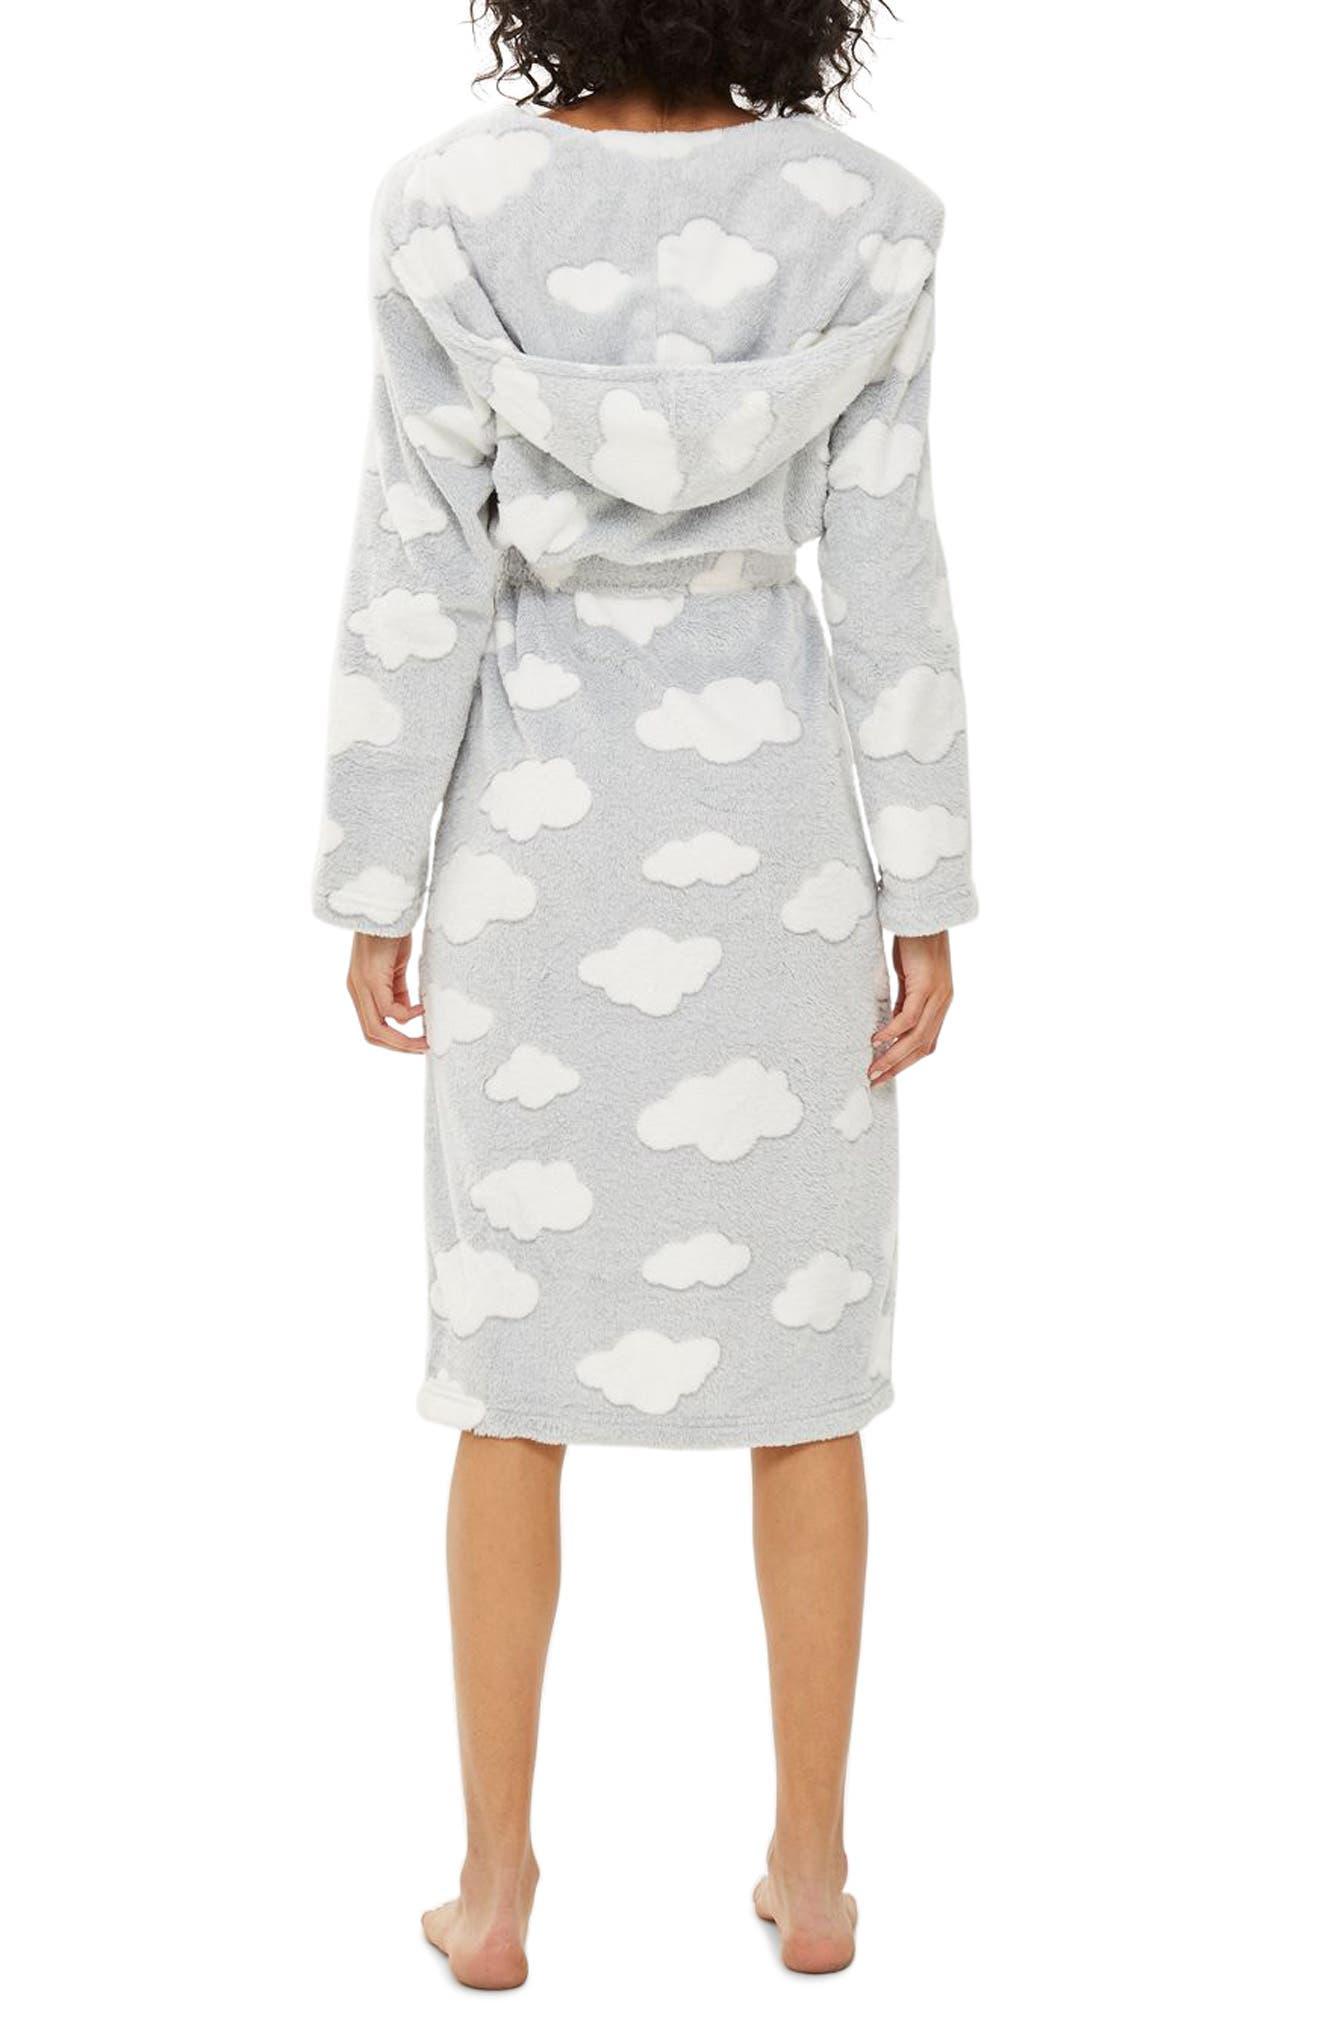 Cloud Print Longline Fleece Robe,                             Alternate thumbnail 2, color,                             020